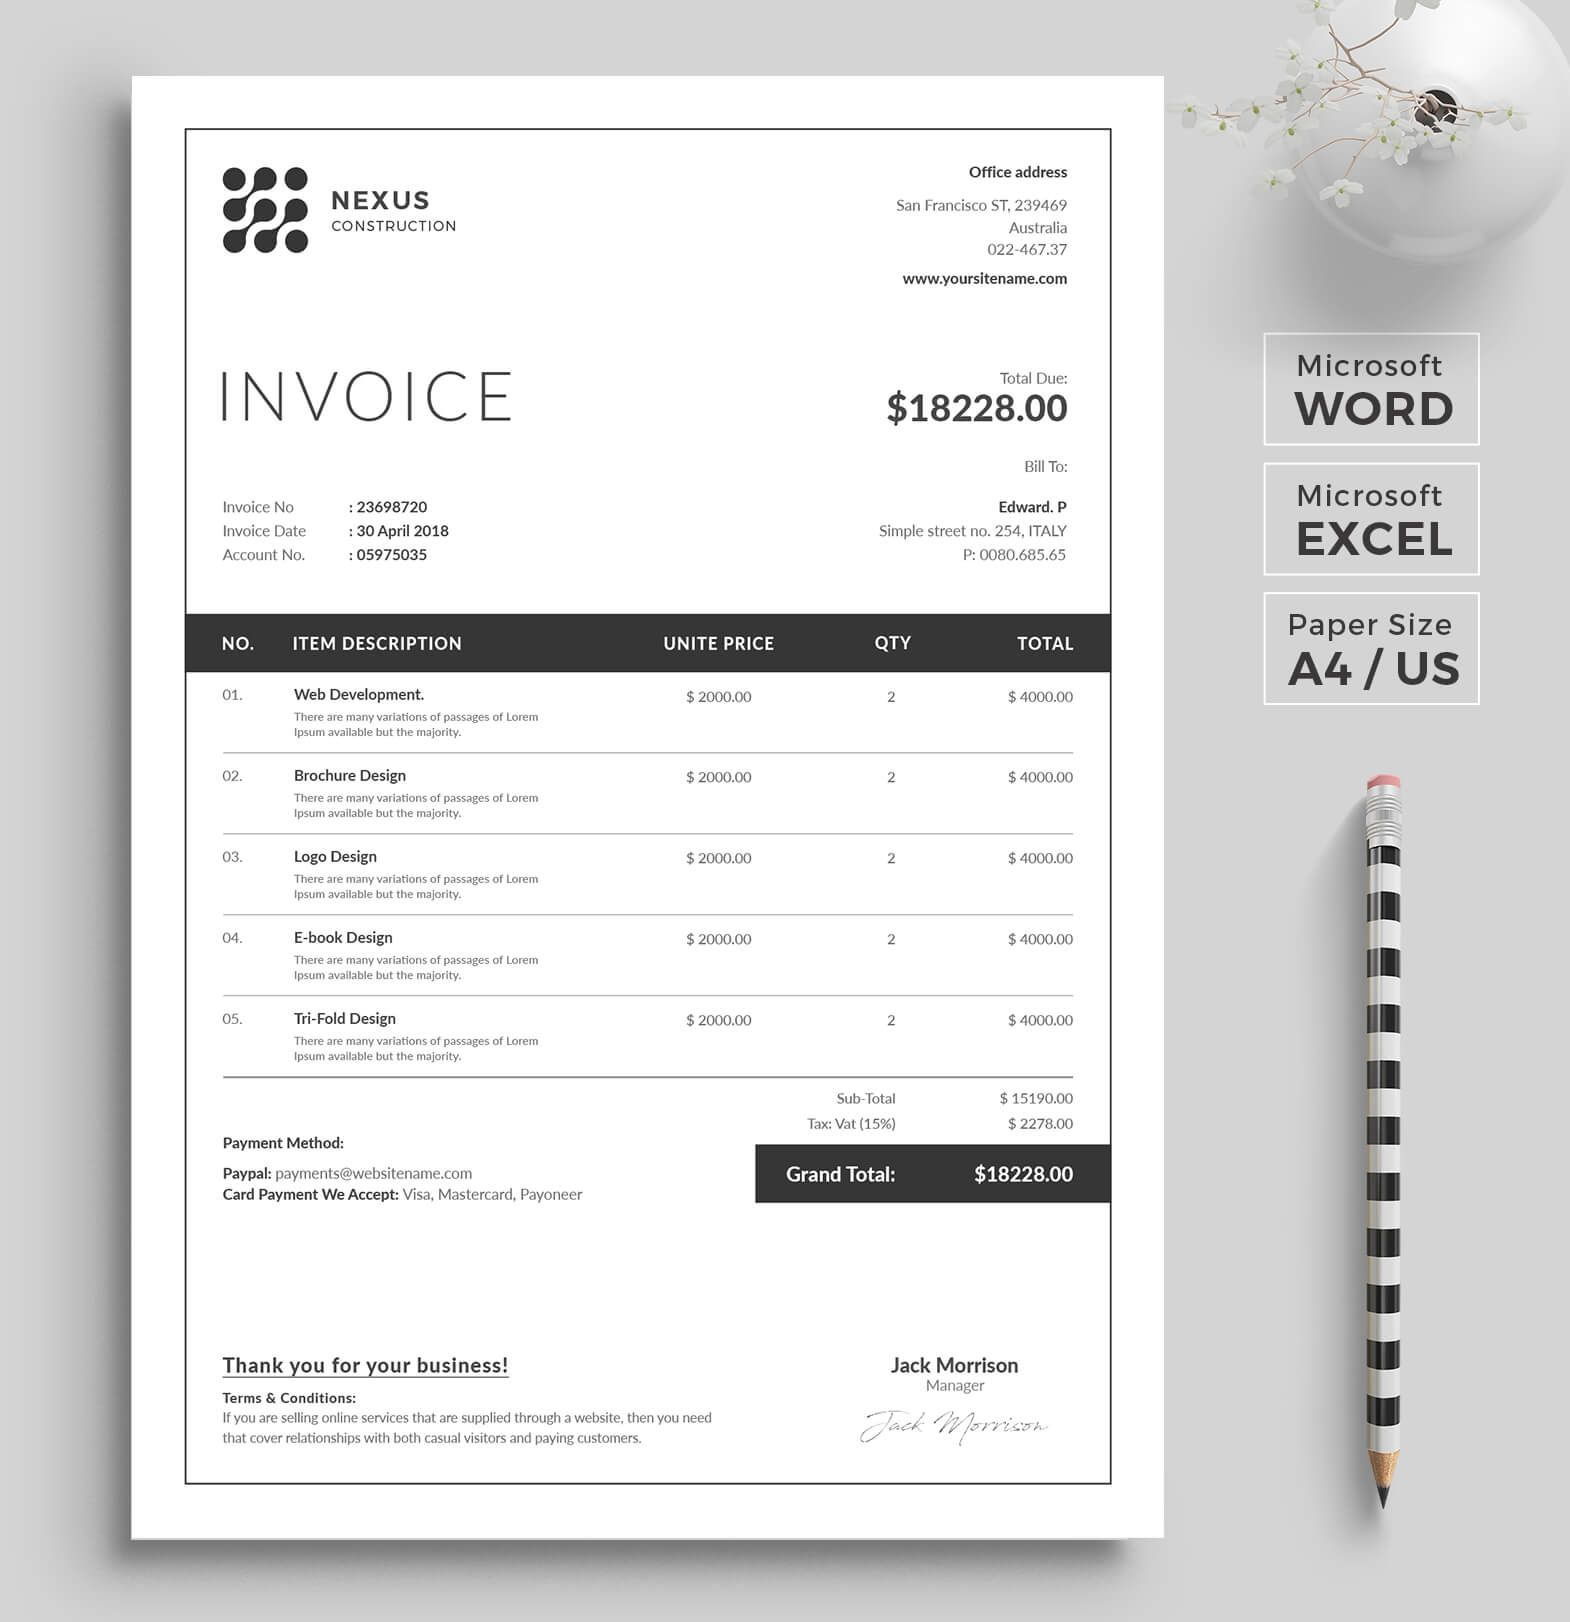 Invoice Template Invoice Design Ms Excel Auto Calculation Etsy Invoice Design Invoice Design Template Photography Invoice